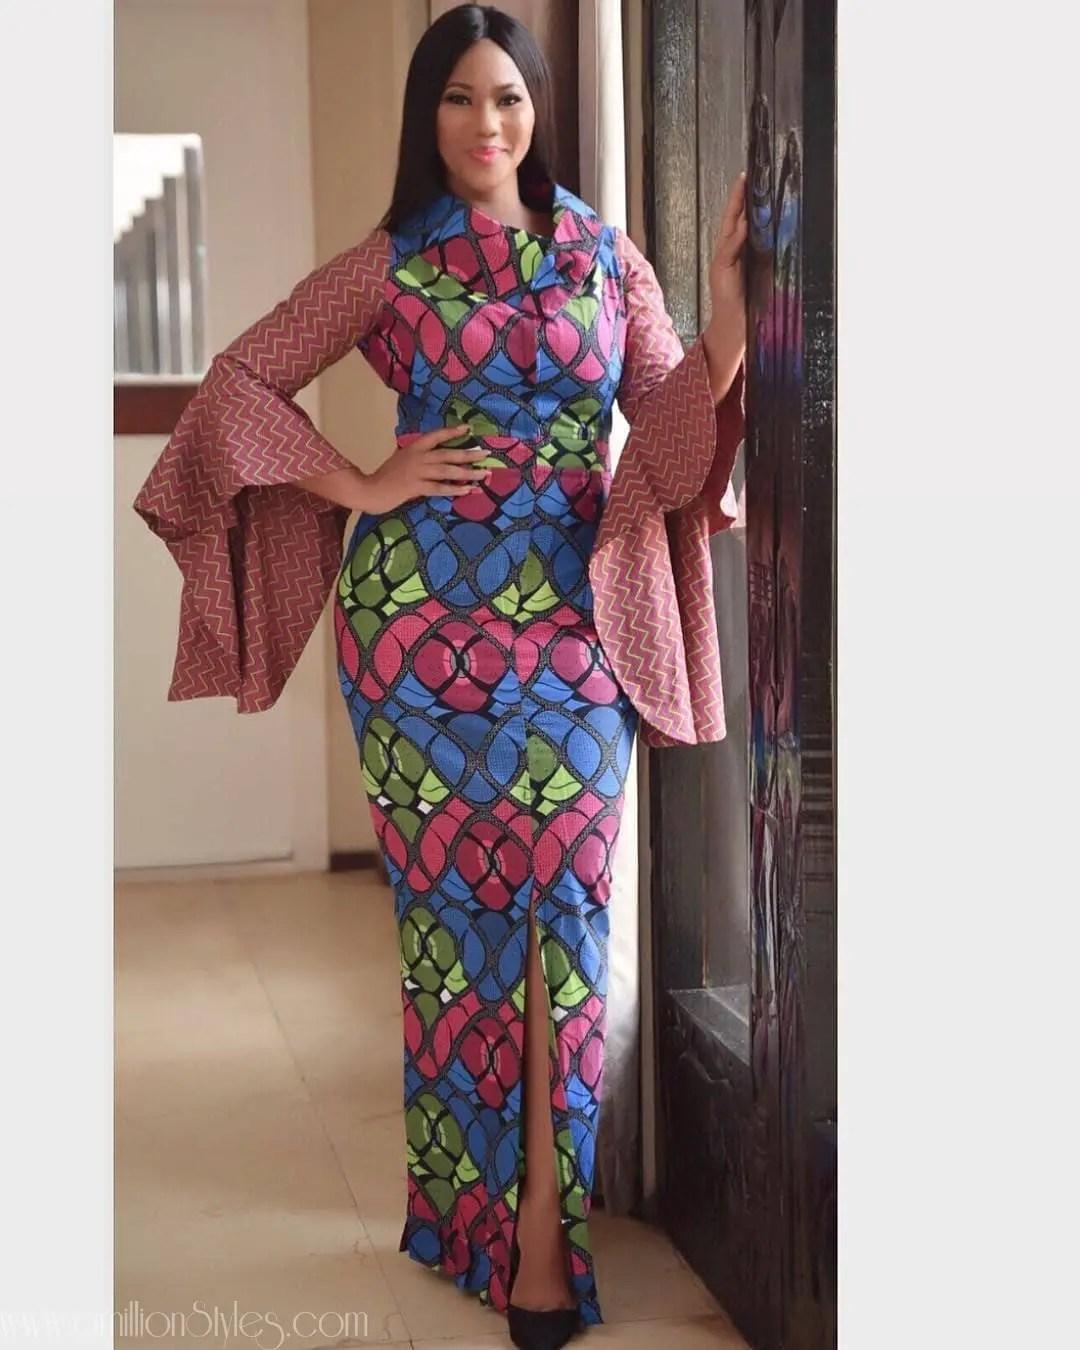 Learn 7 Ways To Mix-Match Your Ankara Fabrics